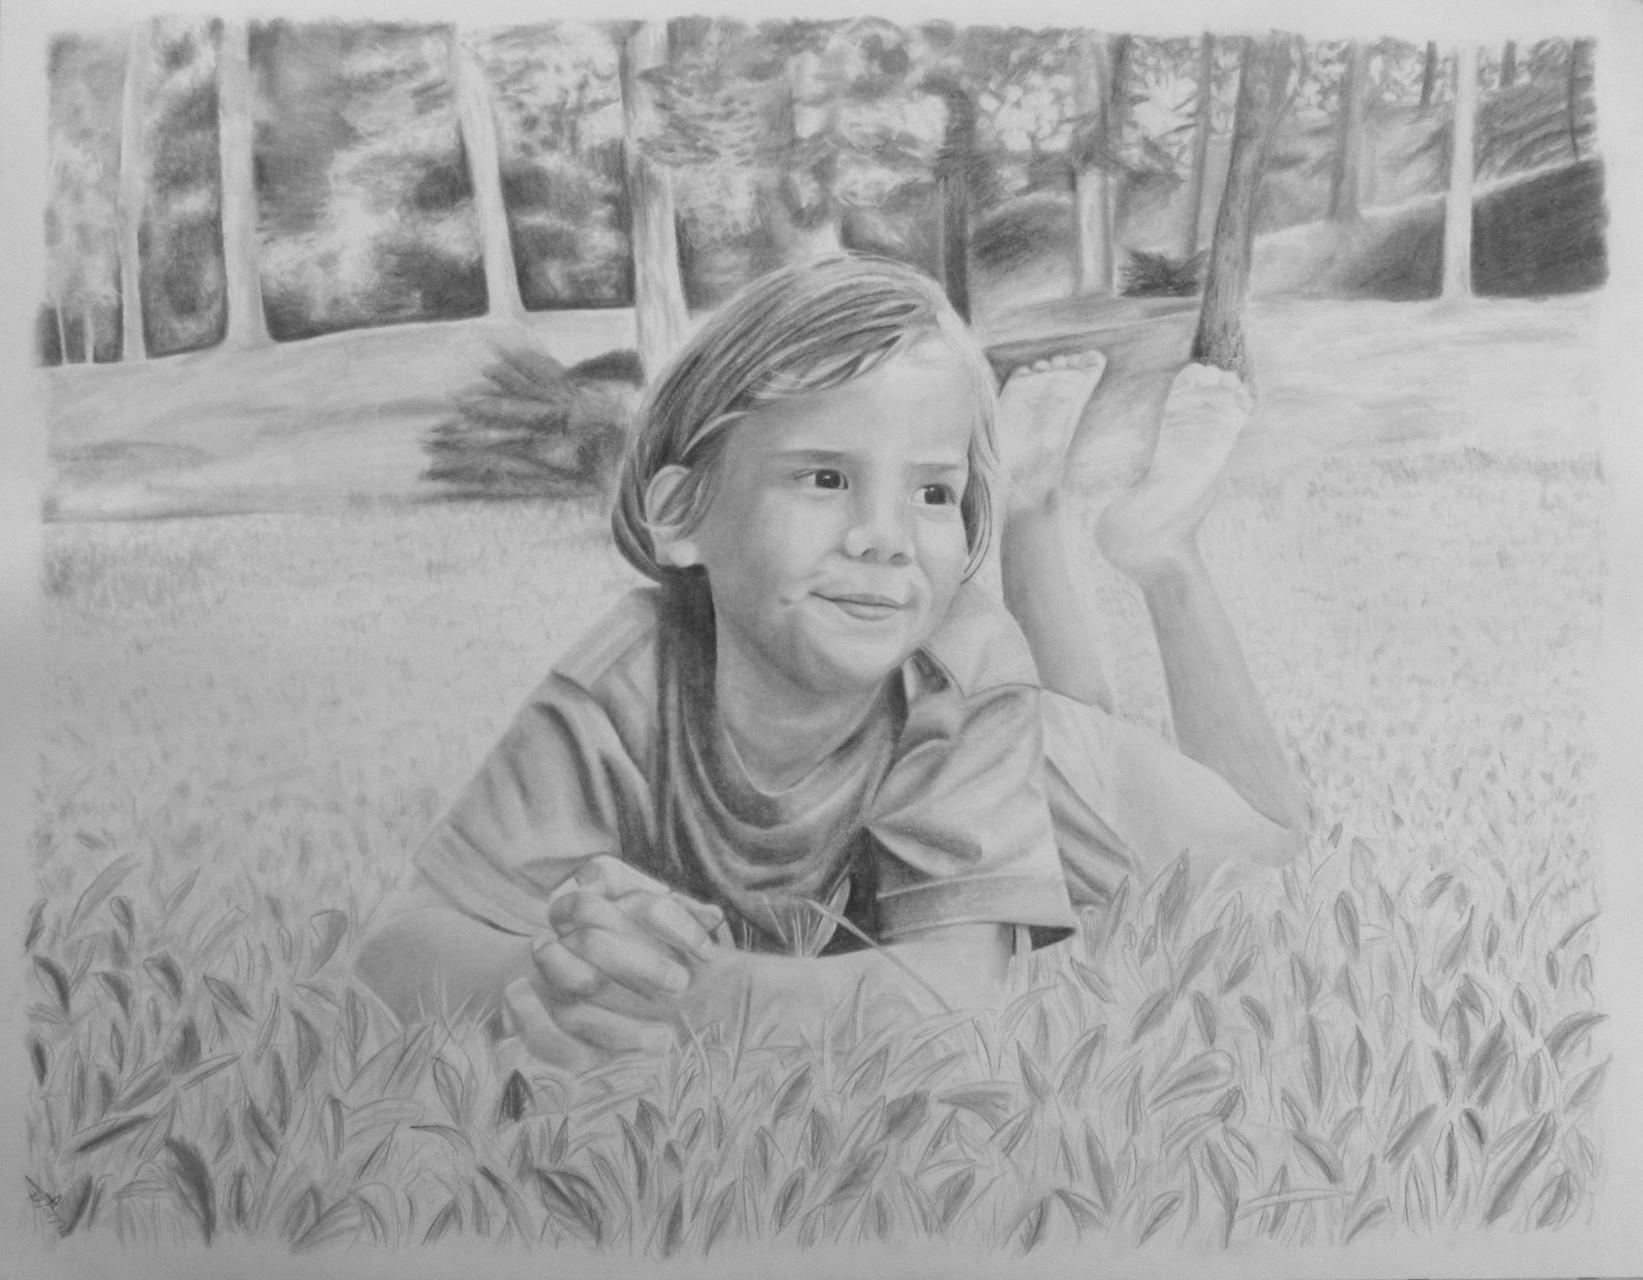 2014 - Commande - Charlotte - Format raisin - Crayon